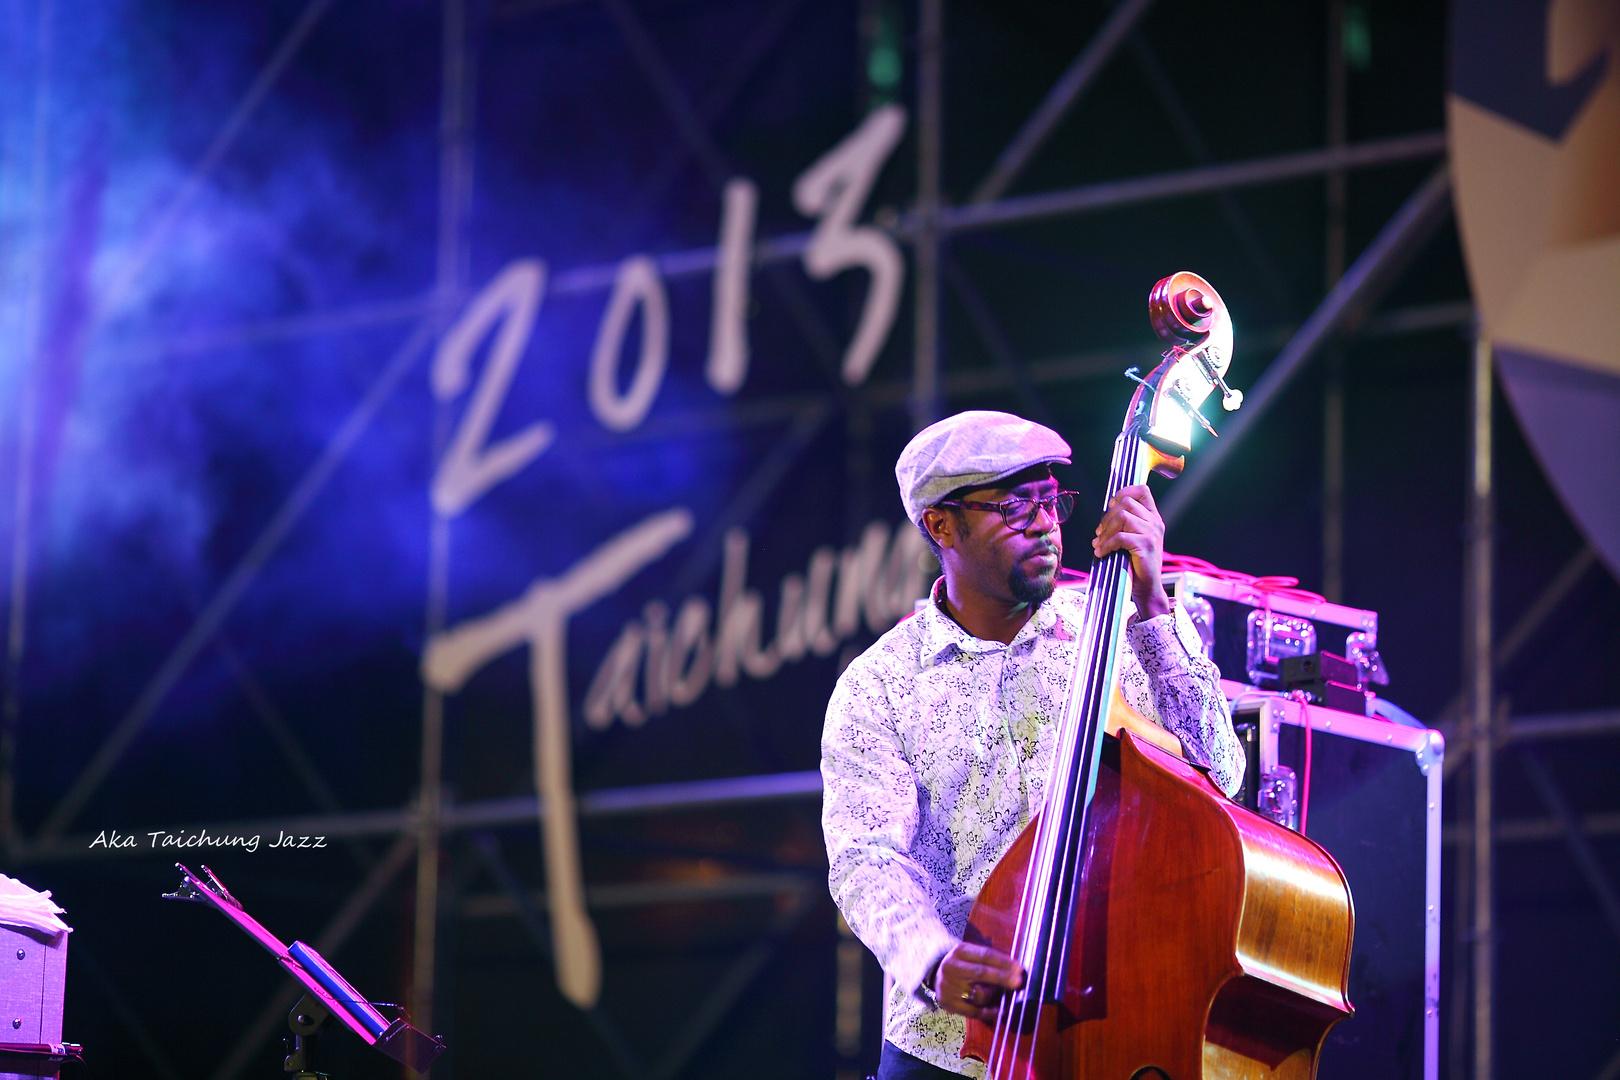 Taiwan Taichung Jazz Festival